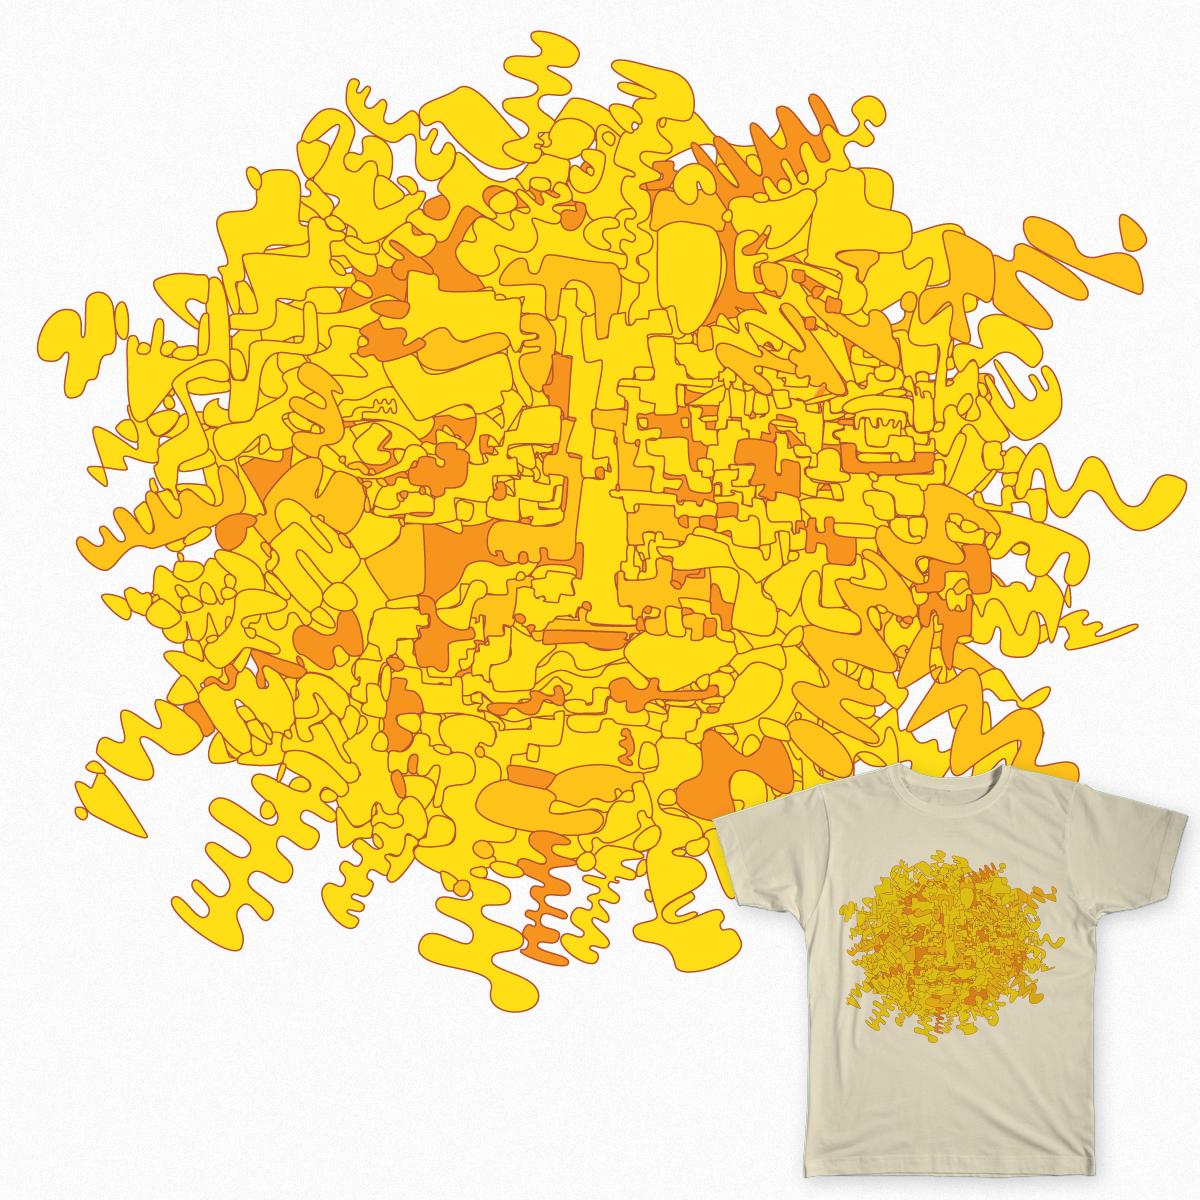 sun doodle by shmugavac on Threadless